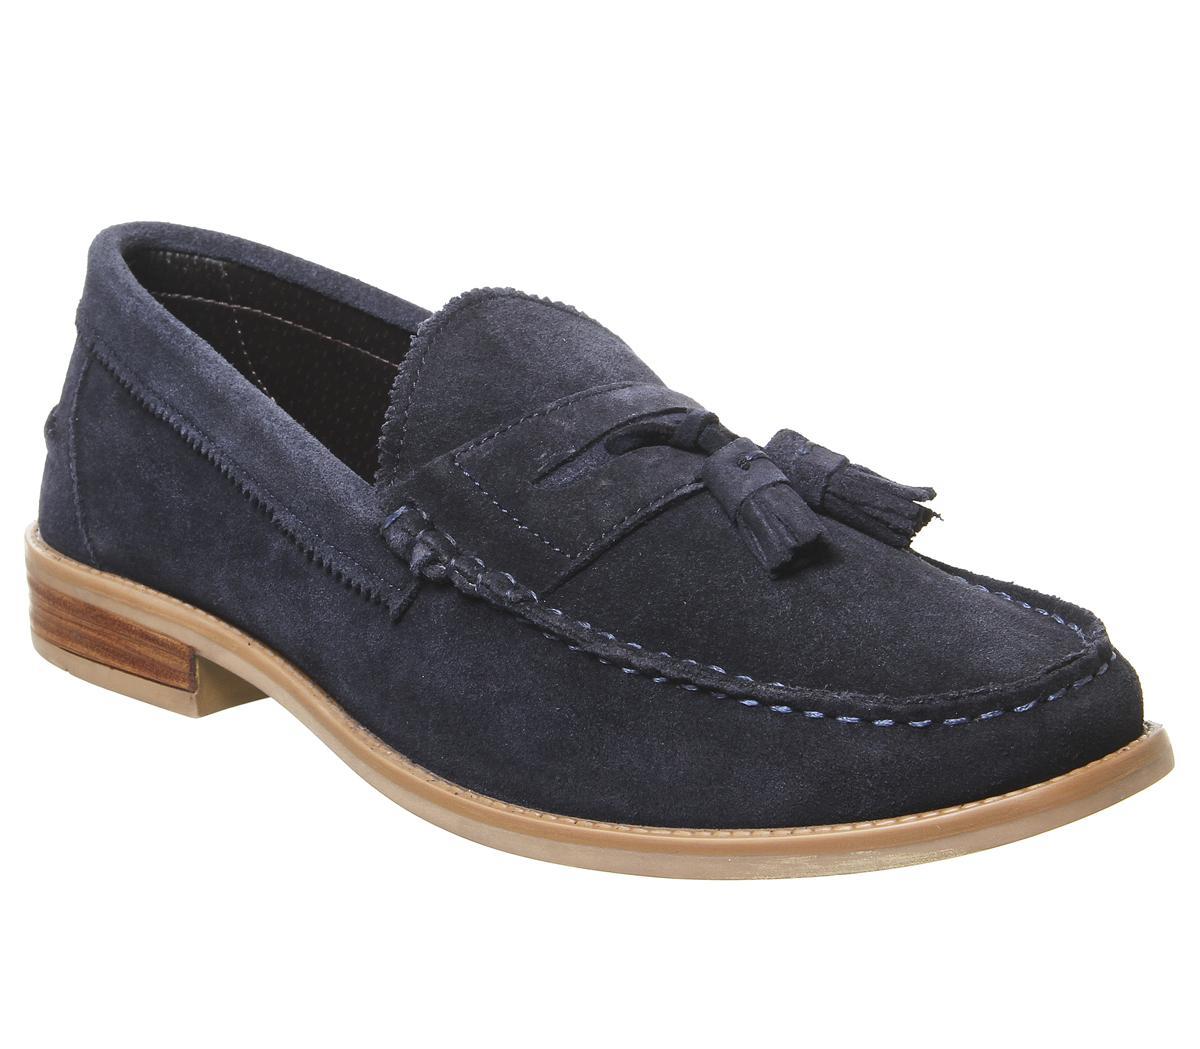 Liho Tassel Loafers